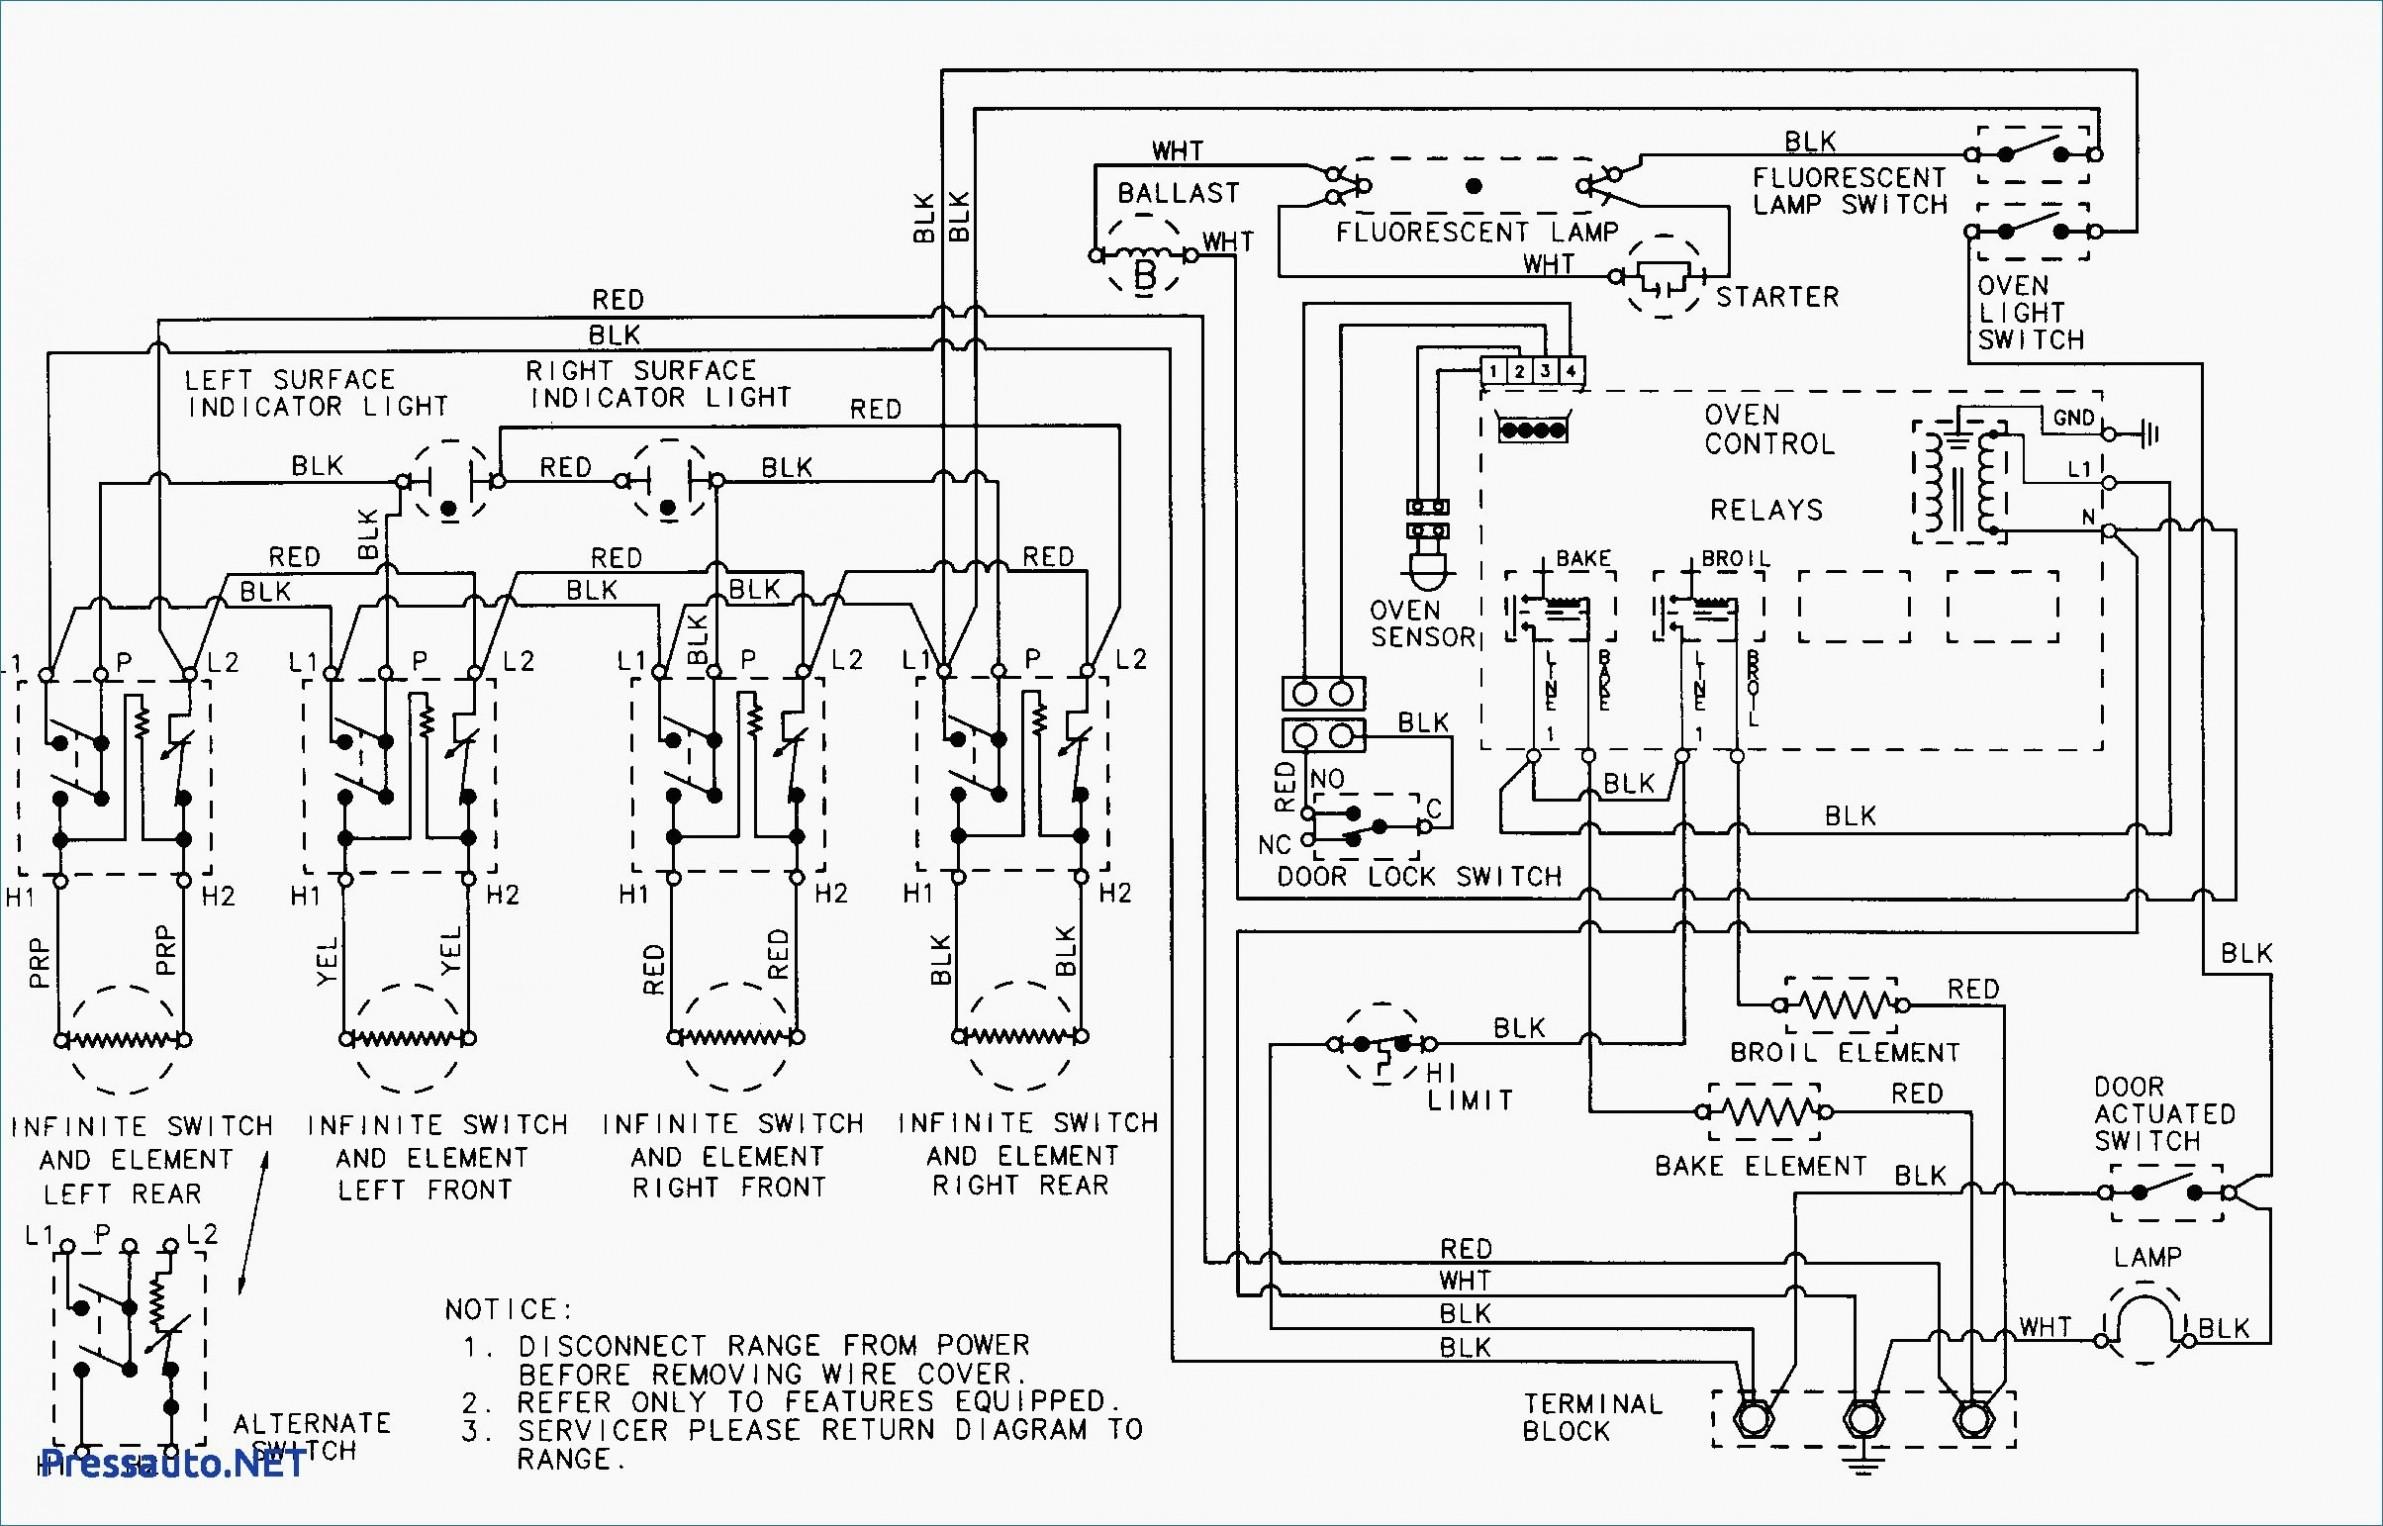 Solar Light Wiring Diagram solar Wiring Diagram Citruscyclecenter Of Solar Light Wiring Diagram